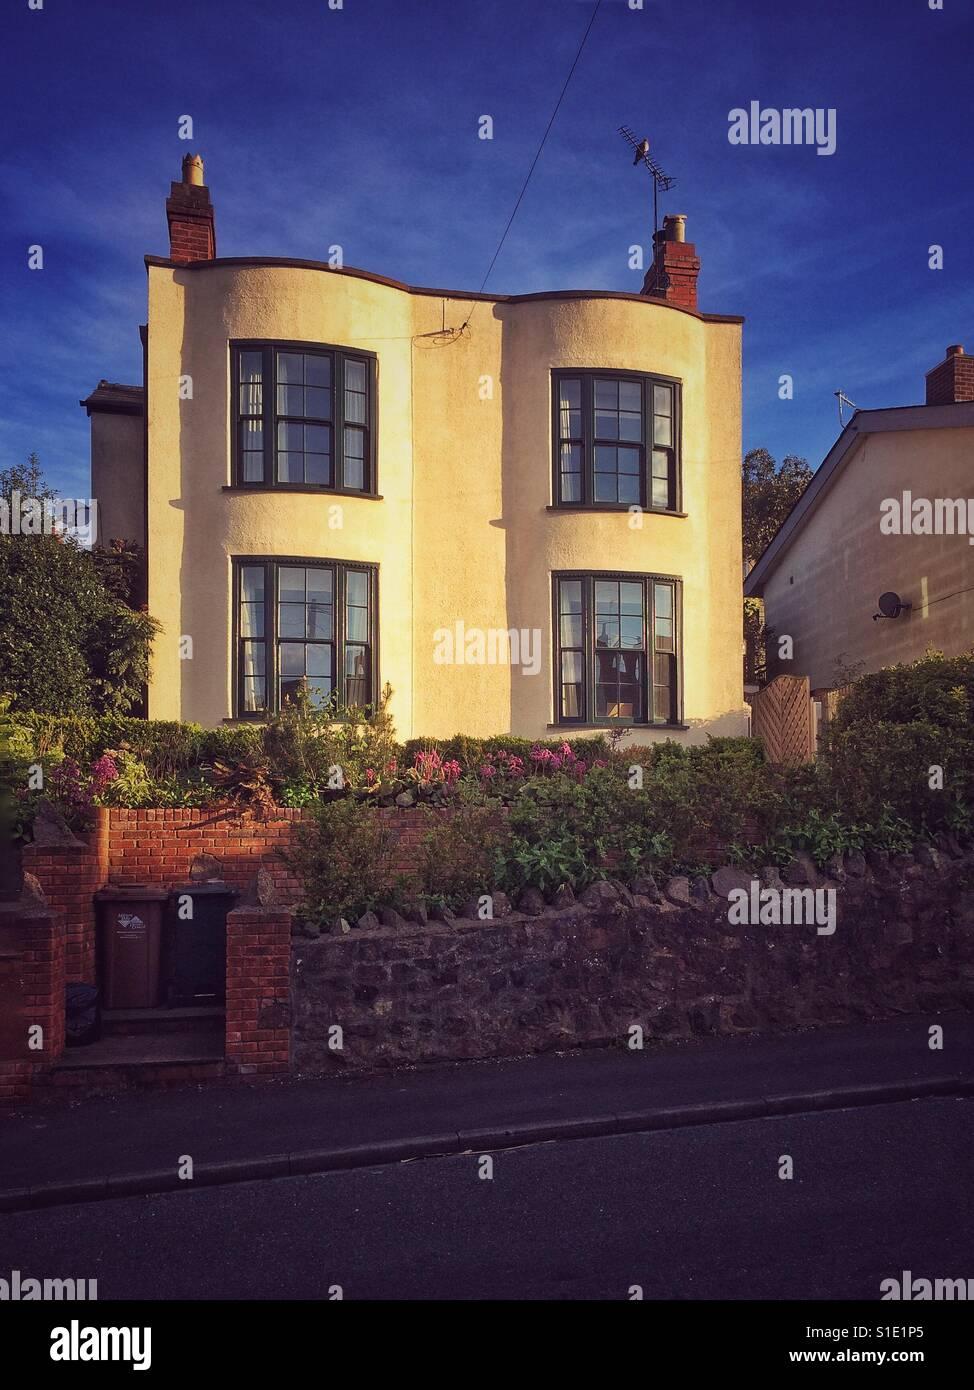 1930s style house in Malvern UK - Stock Image